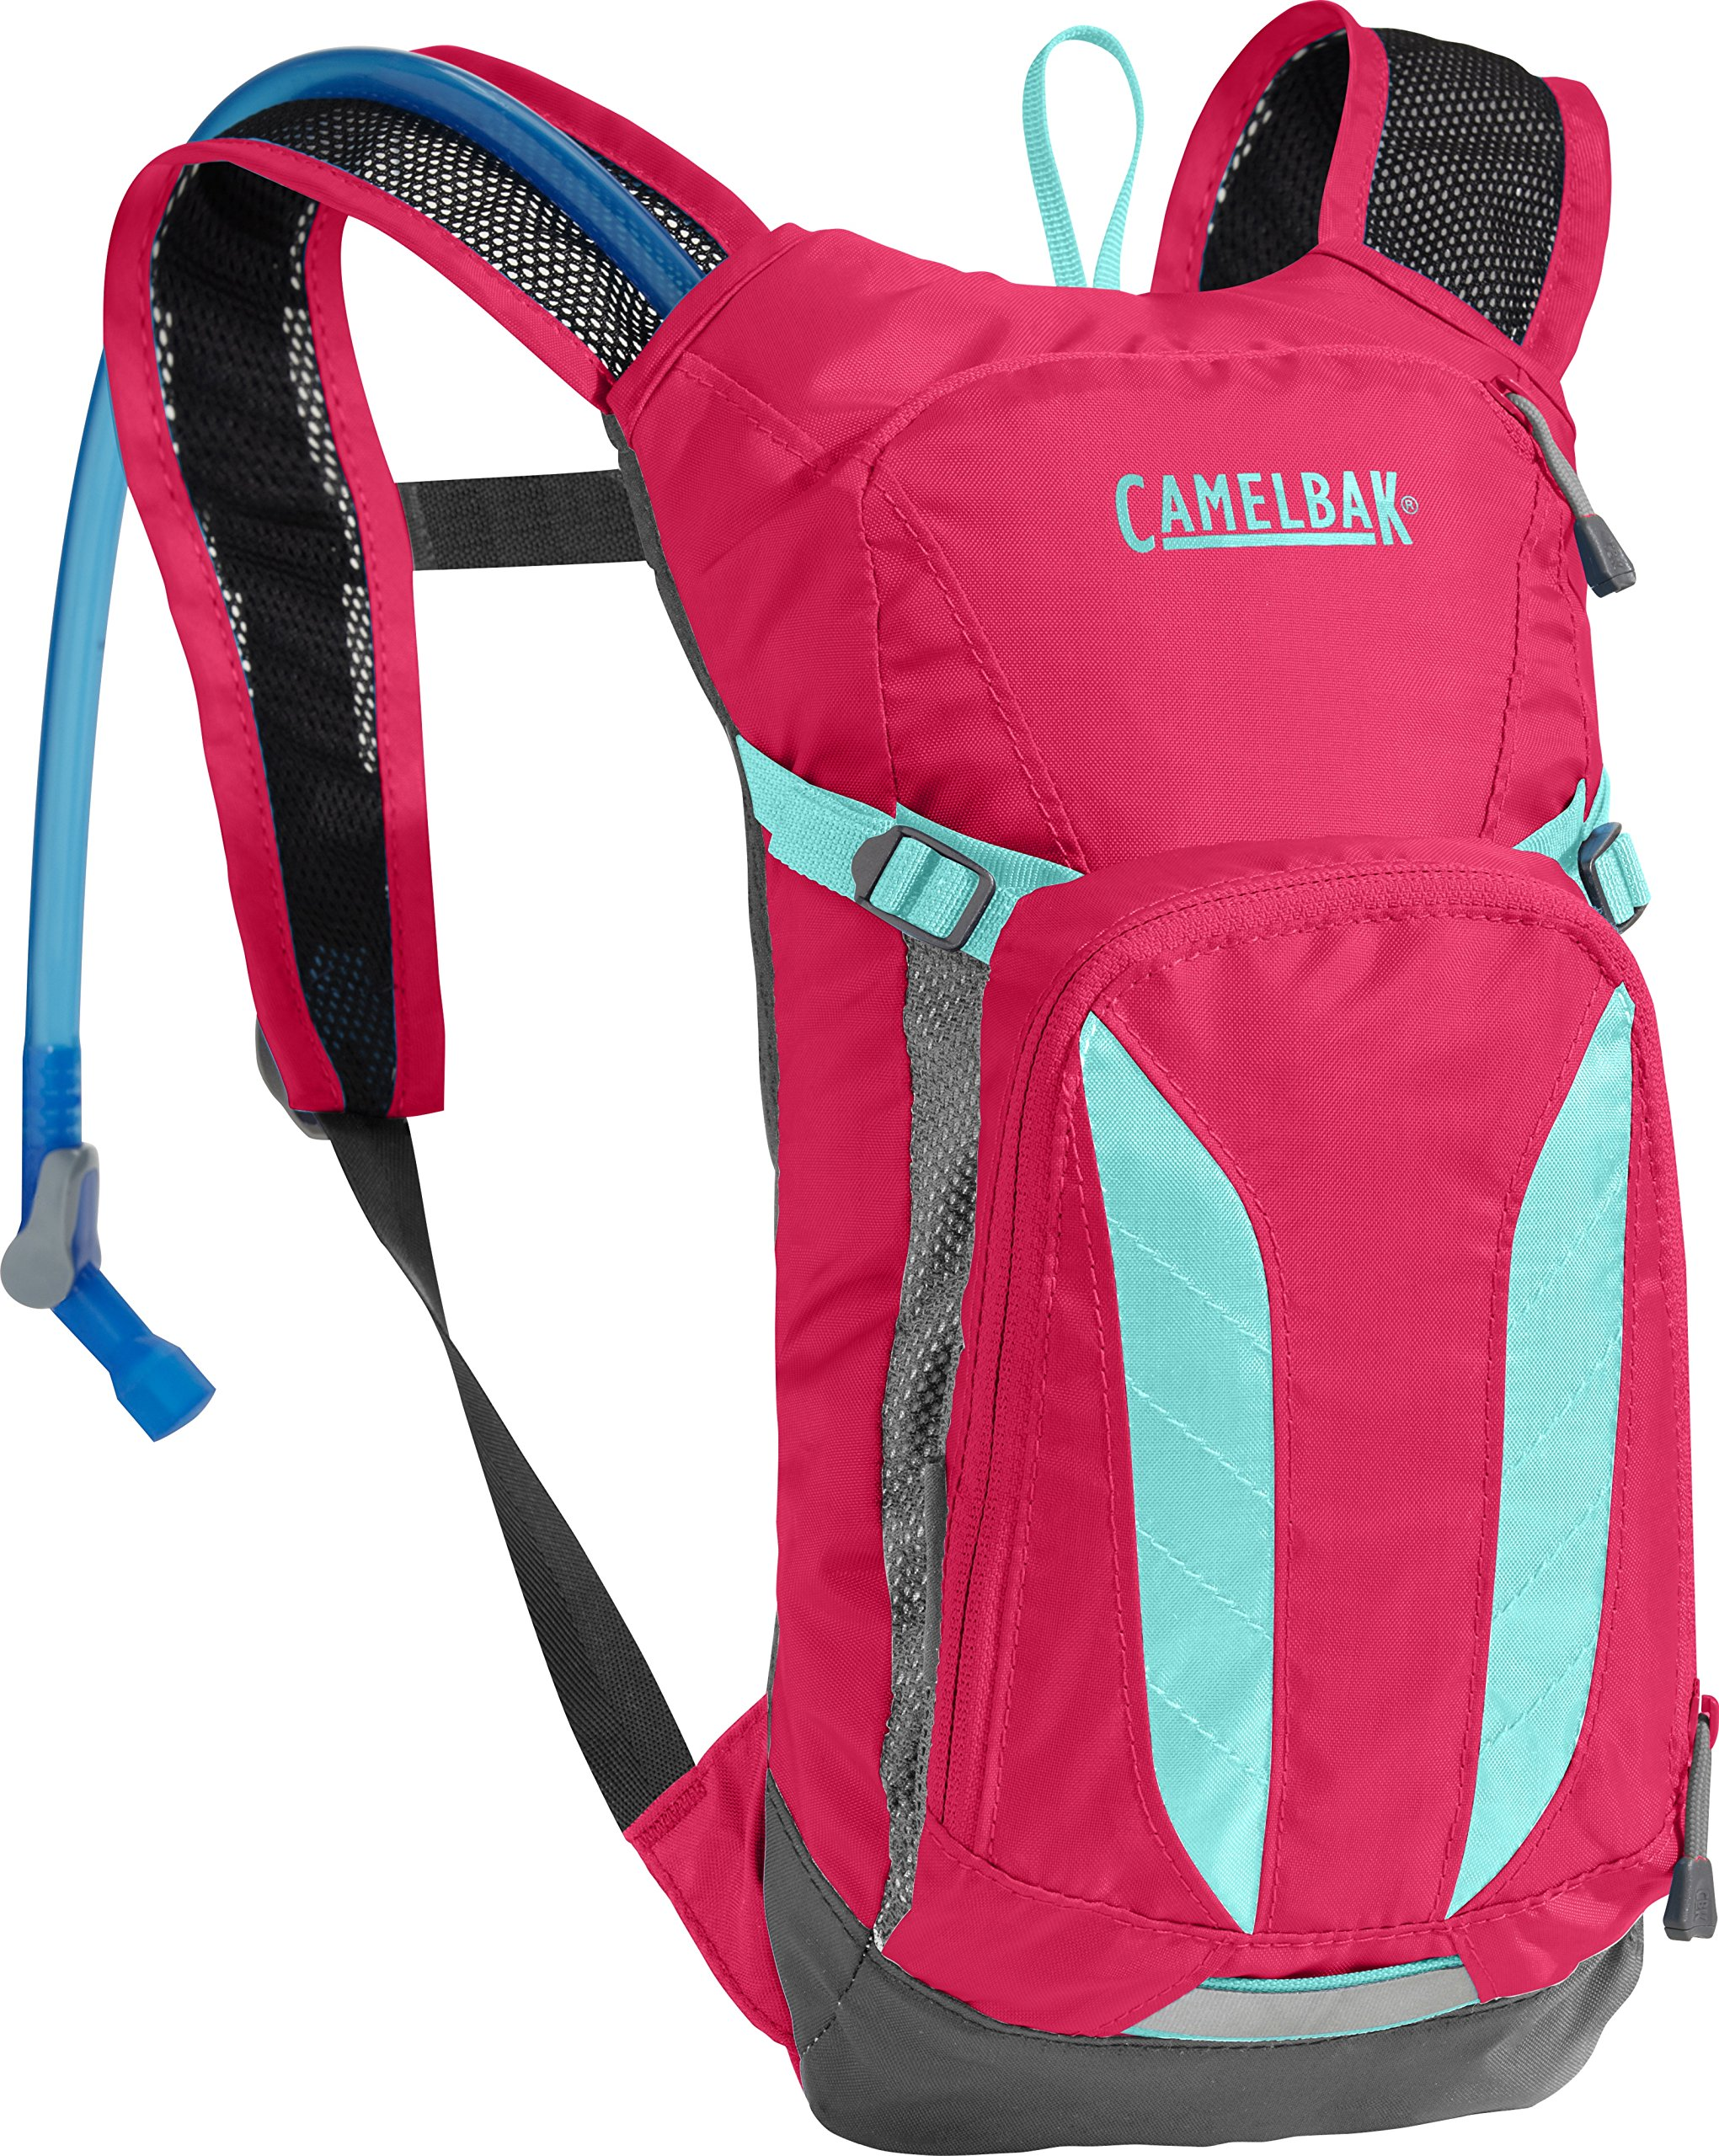 CamelBak Kids Mini M.U.L.E. Crux Reservoir Hydration Pack, Azalea/Aruba Blue, 1.5 L/50 oz